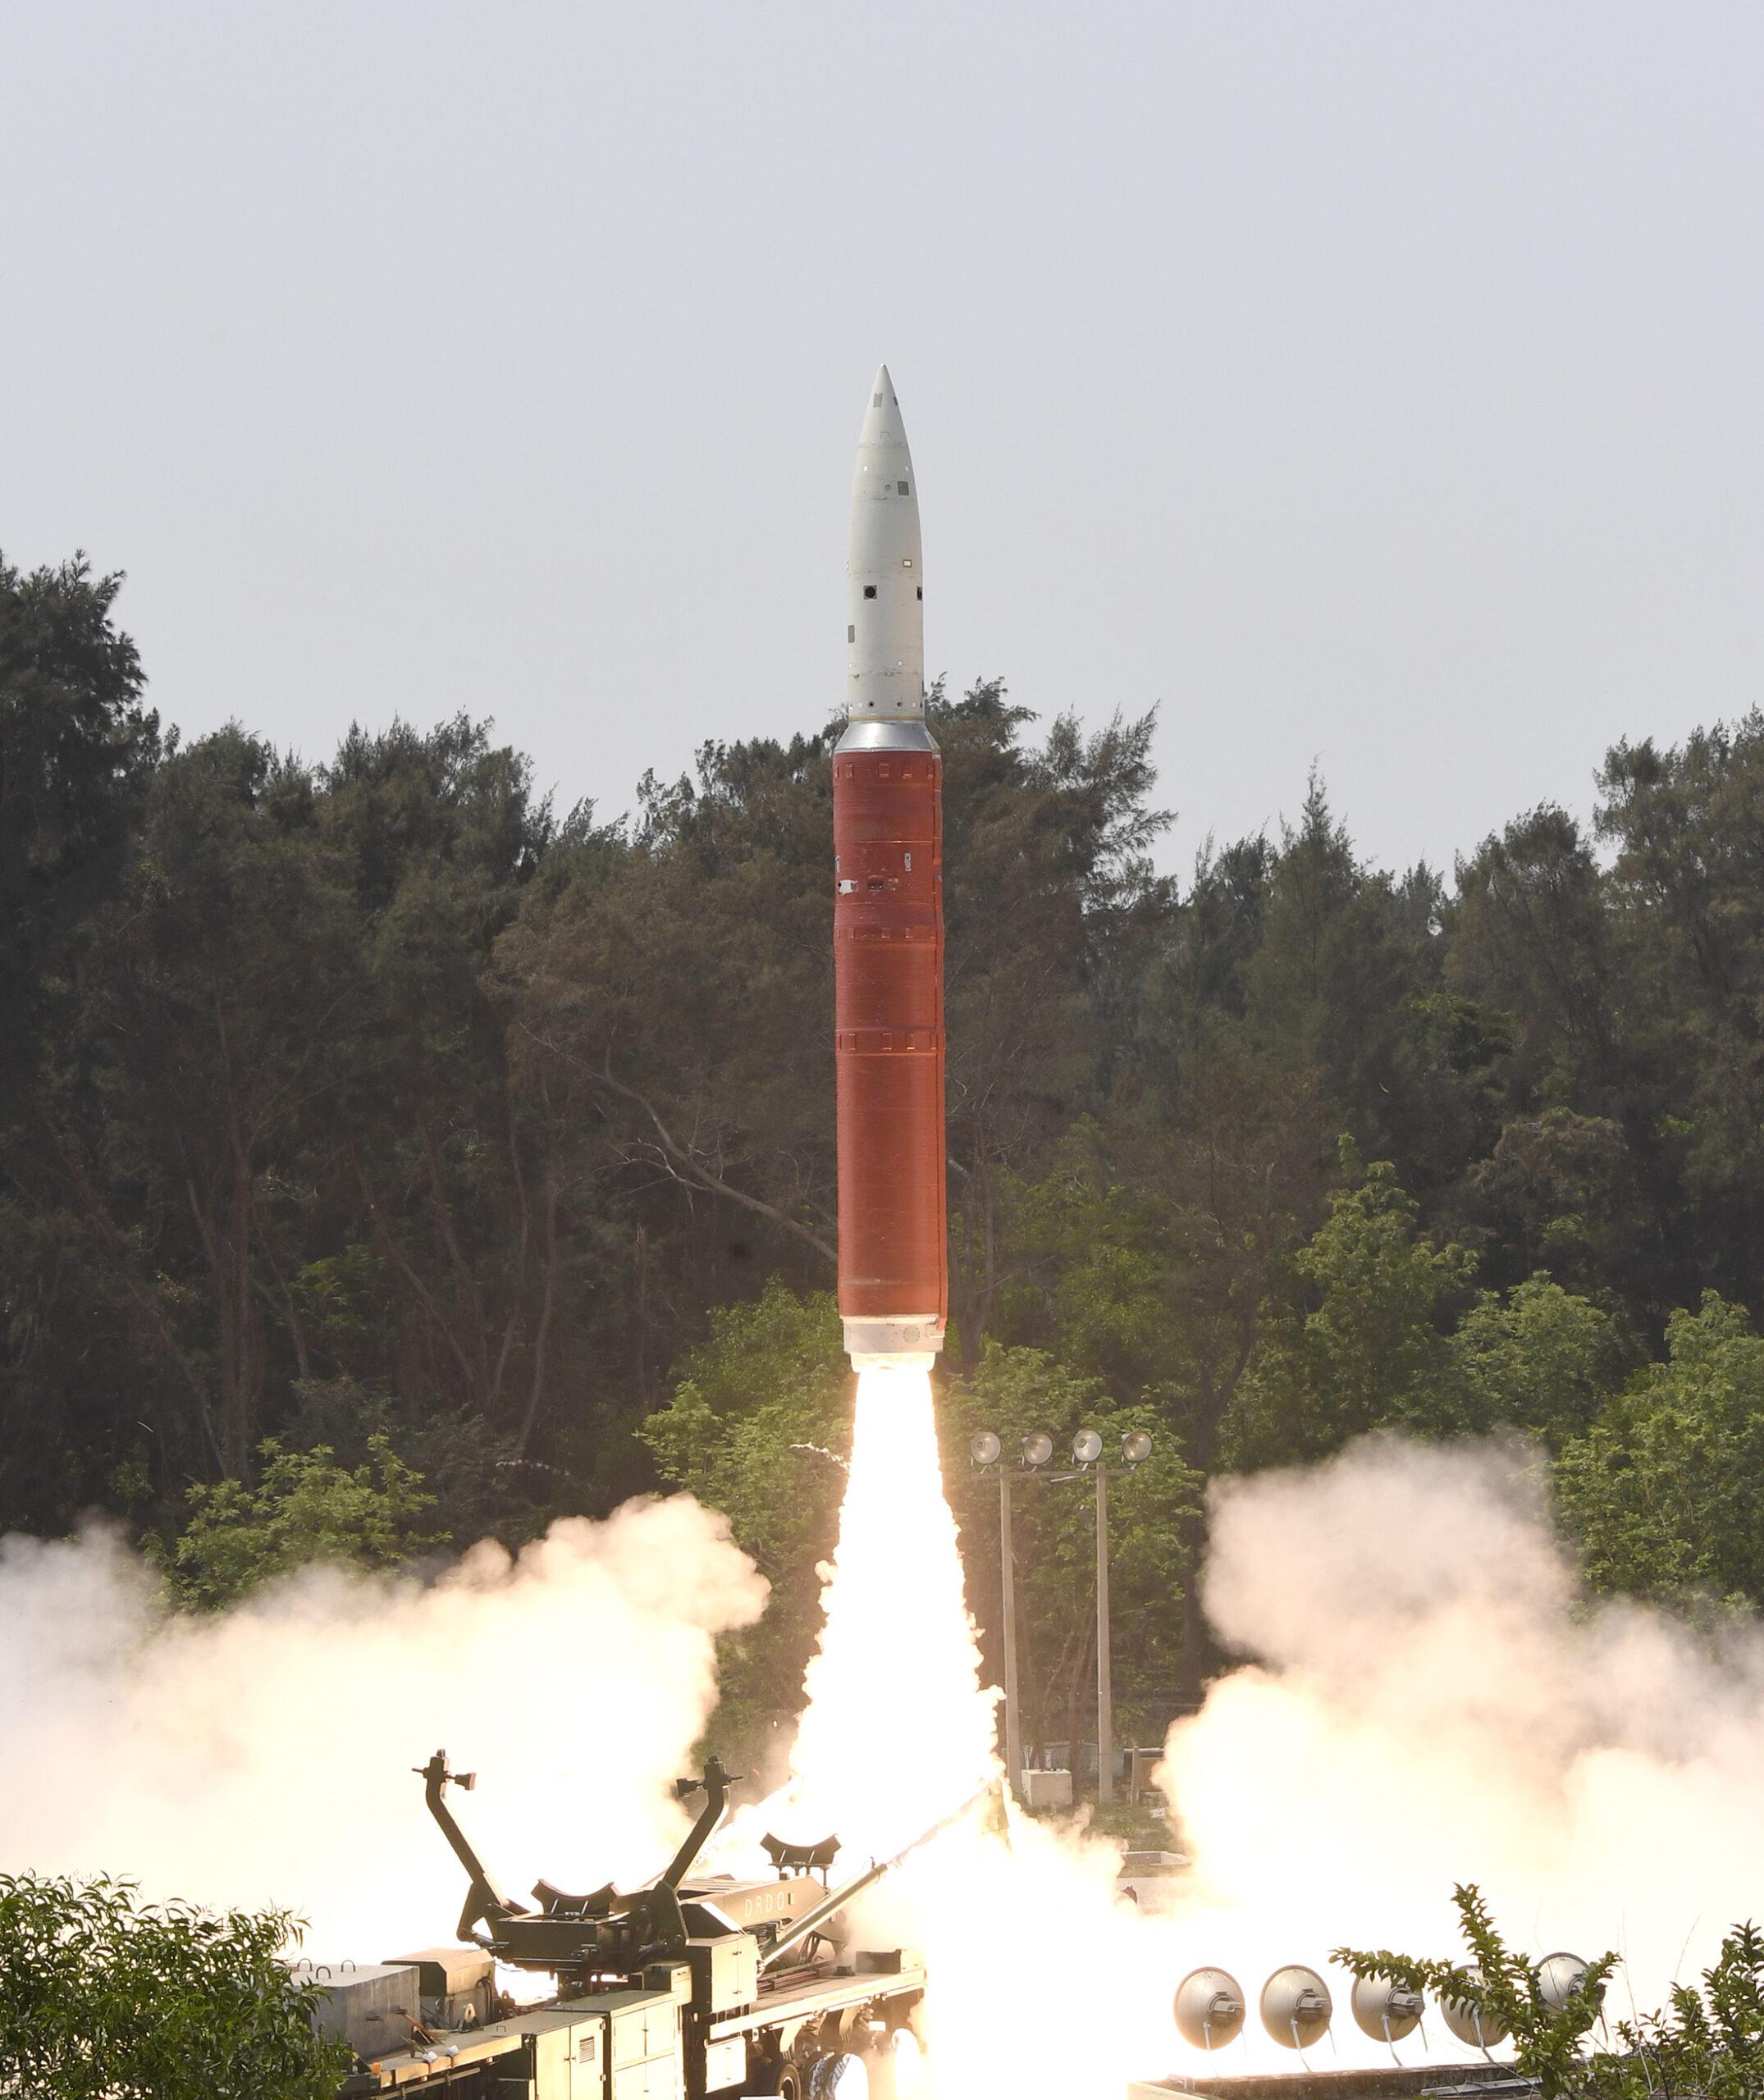 Developing Cutting Edge Space Technologies on DRDO Menu